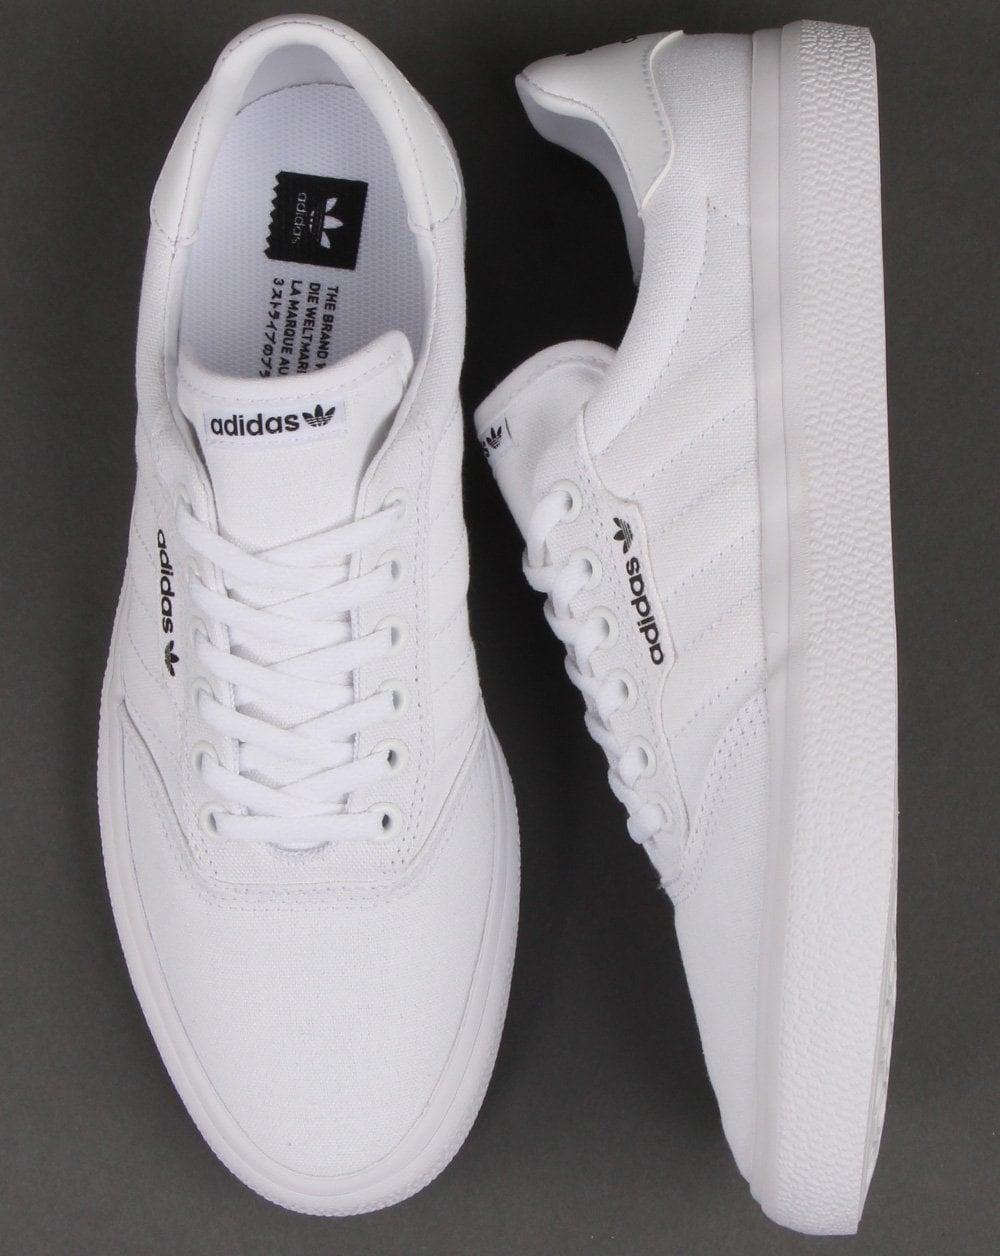 Adidas 3mc Trainers White/white